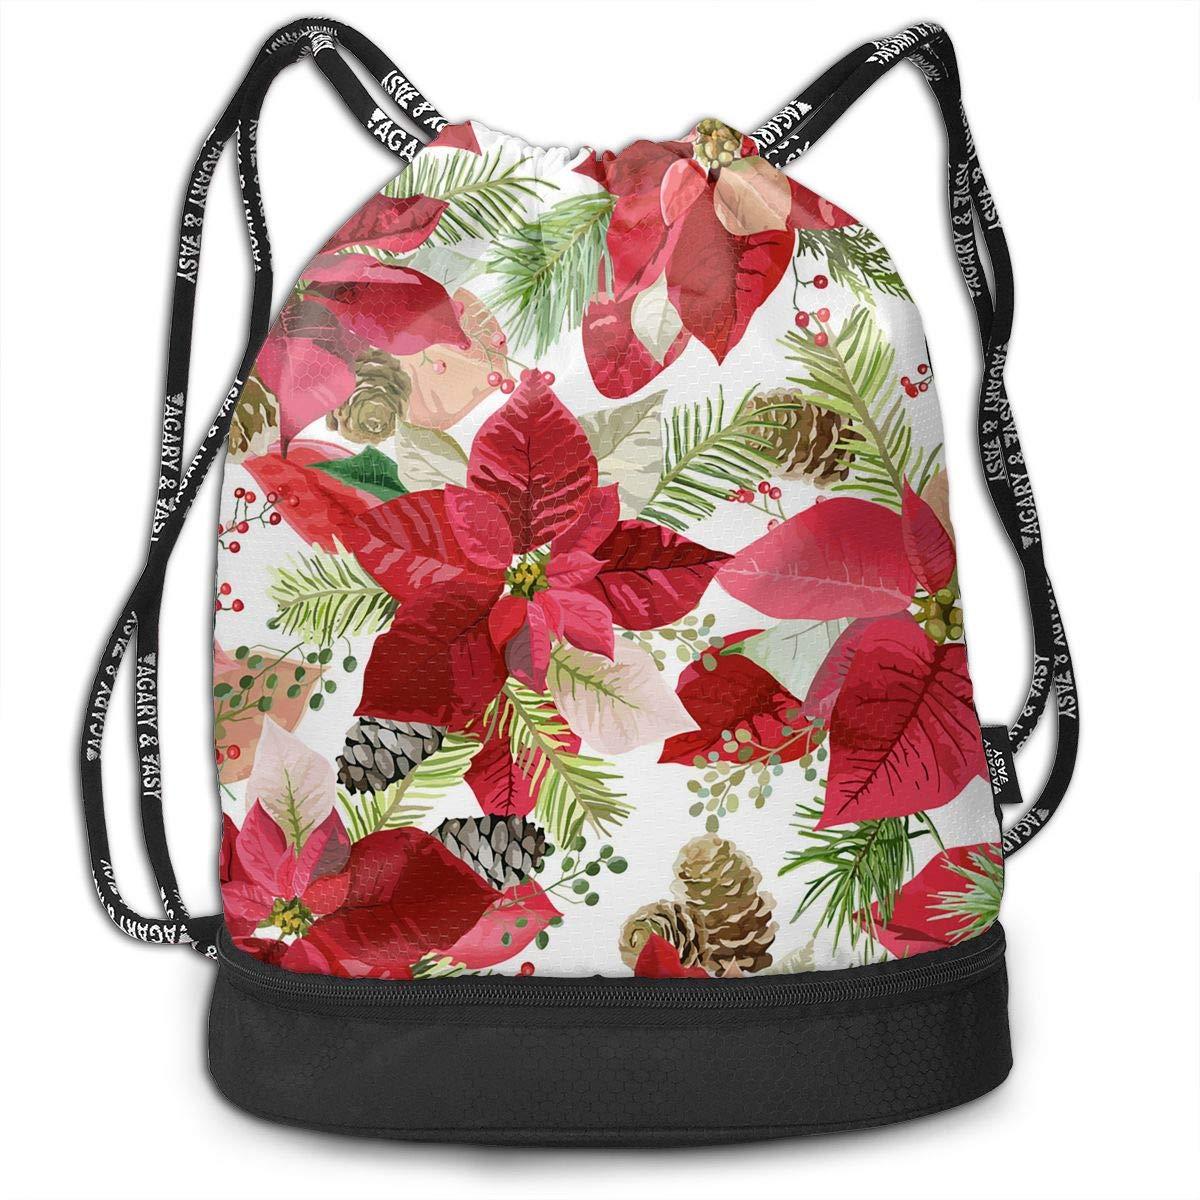 Amazon.com: Athletic Yoga Gym Sack Bag Poinsettia Flowers ...